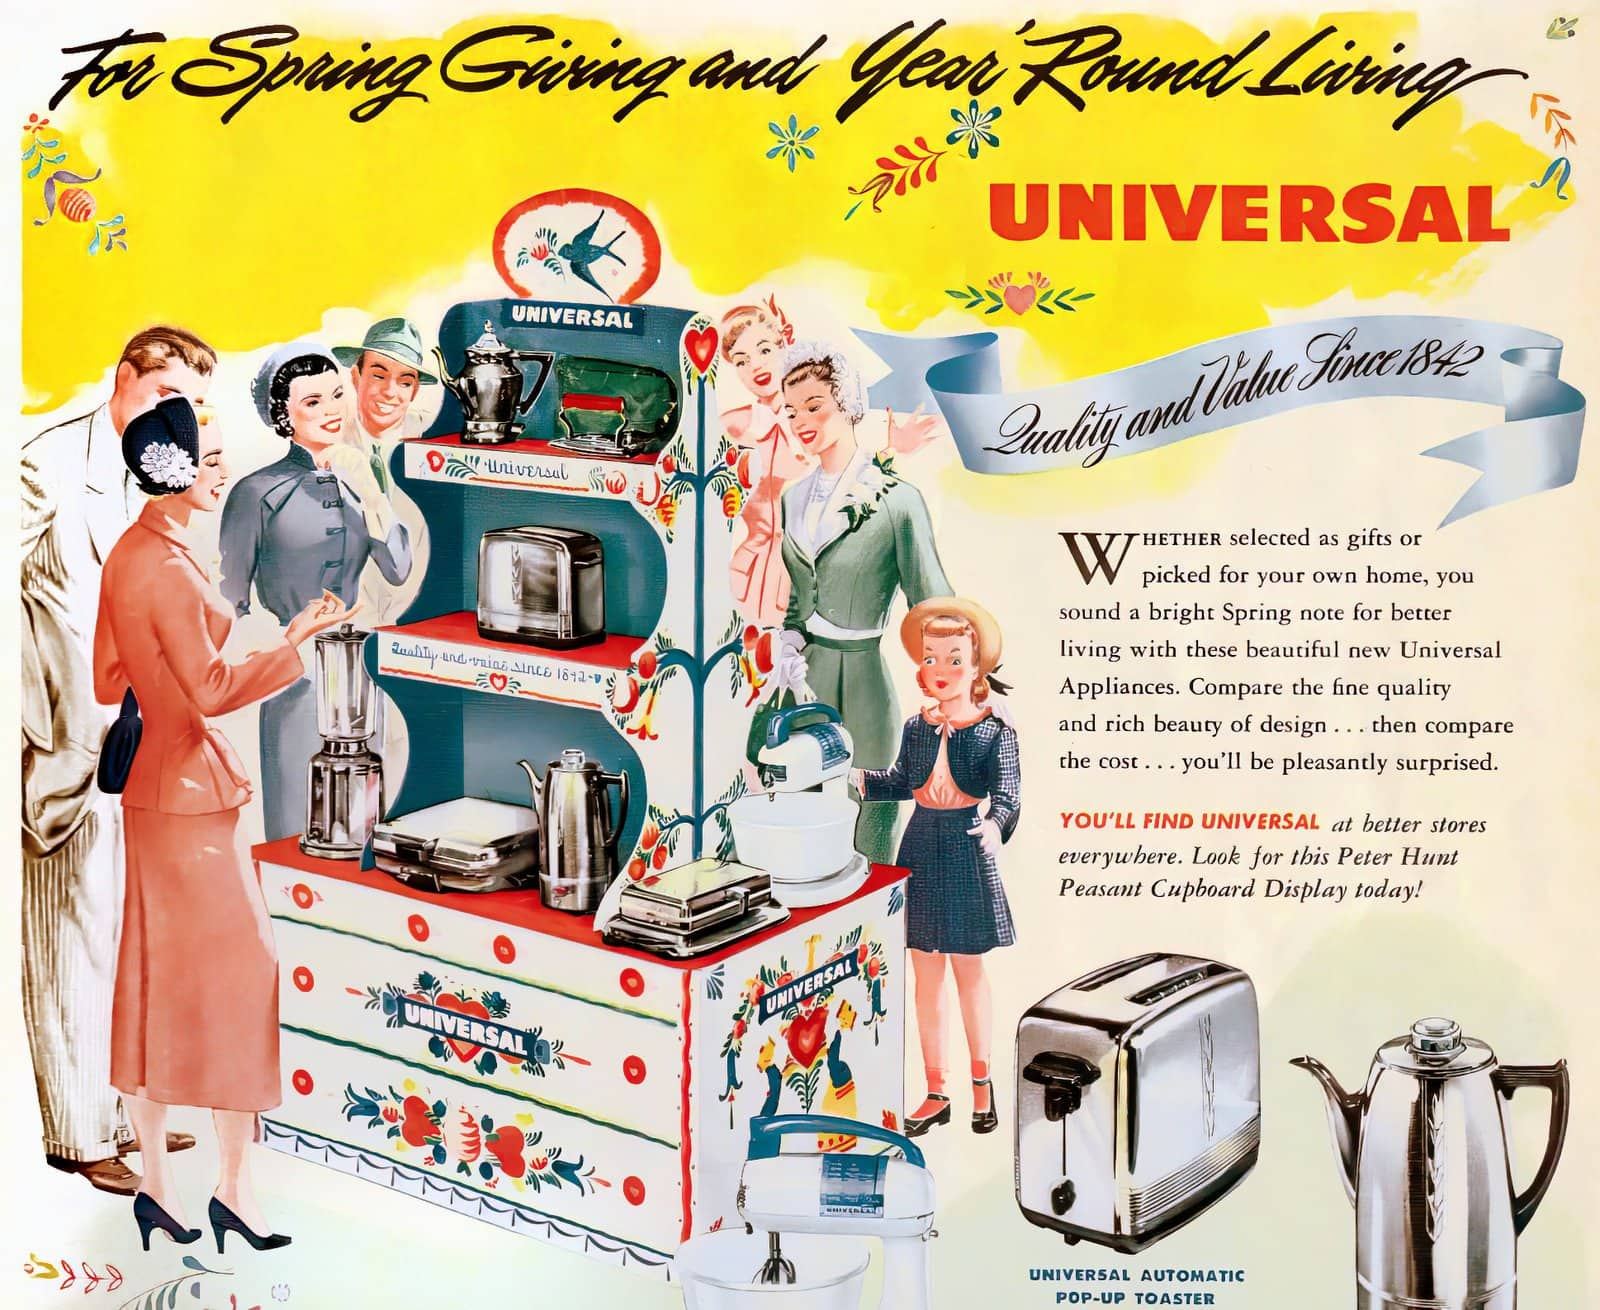 Universal appliances - Peter Hunt (1940s)